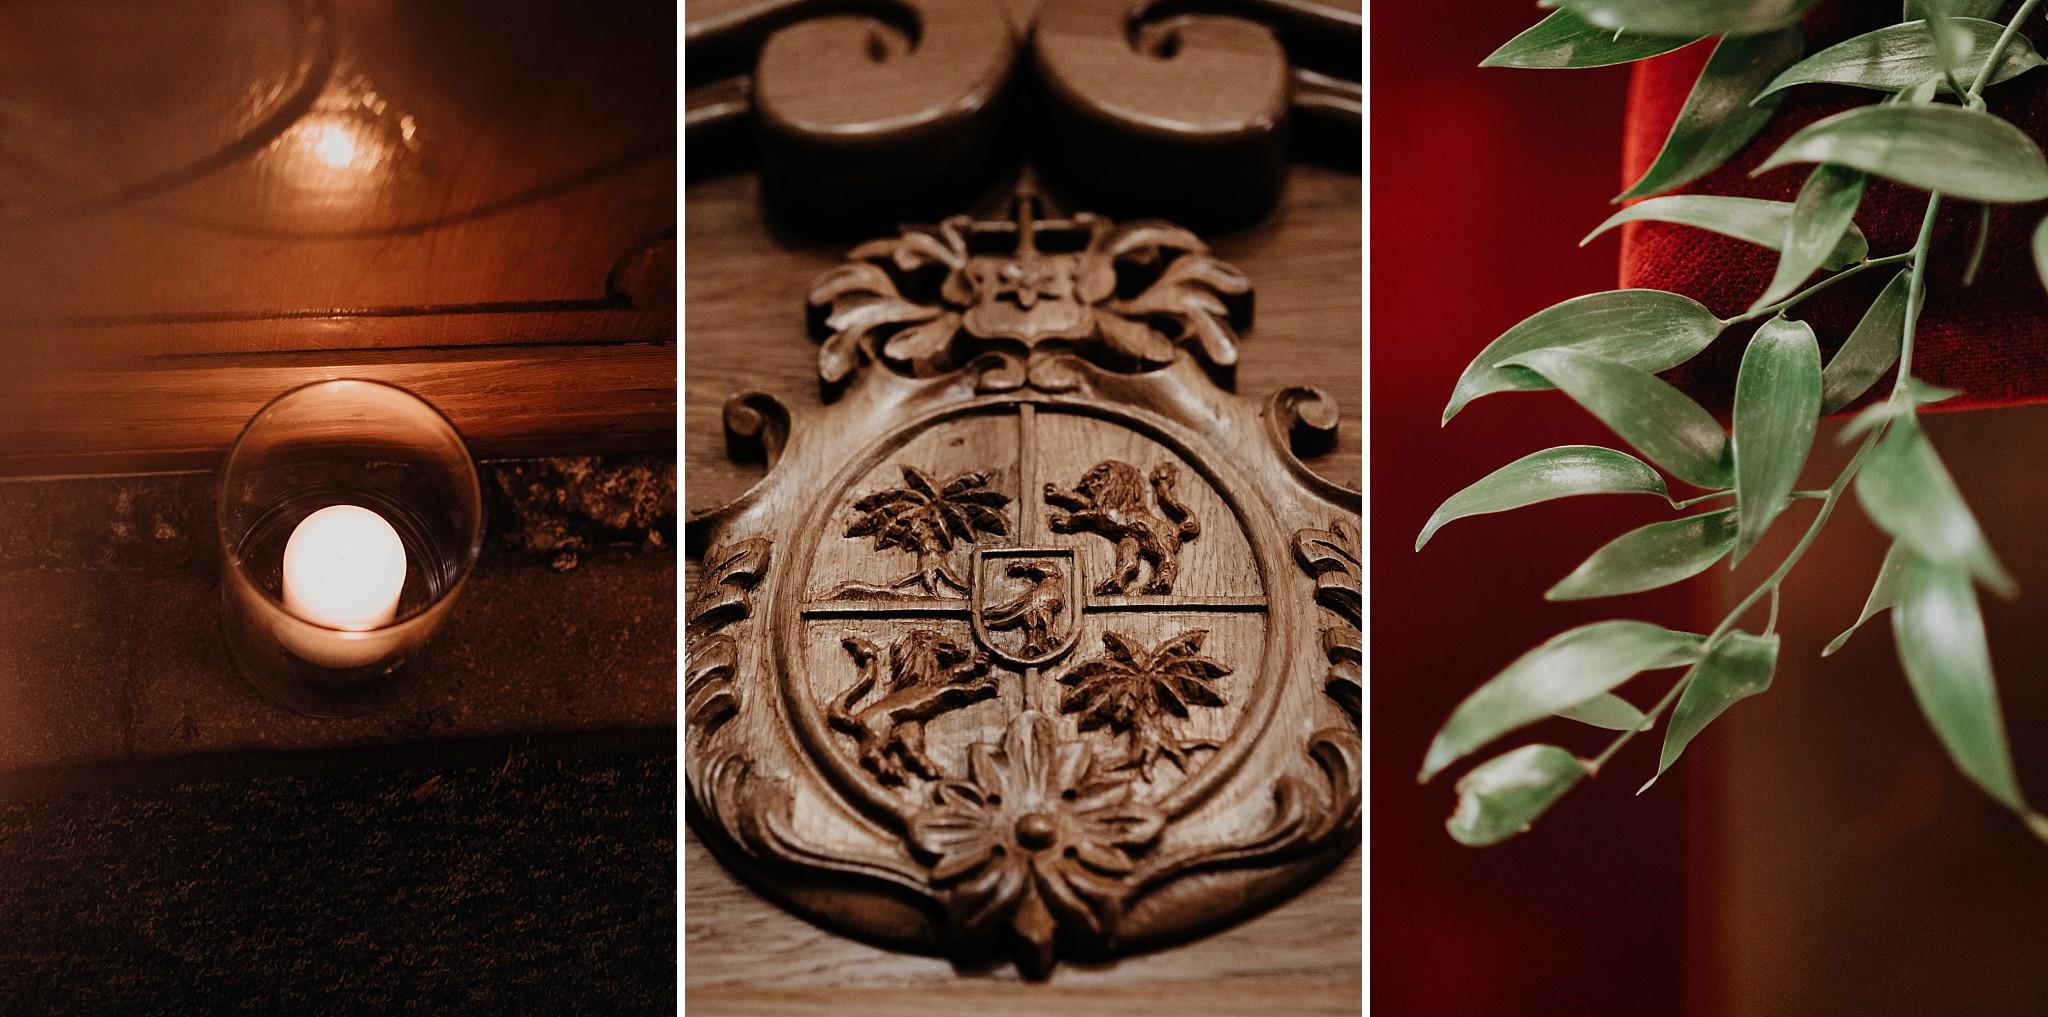 fotograf poznan wesele dobra truskawka piekne wesele pod poznaniem wesele w dobrej truskawce piekna para mloda slub marzen slub koronawirus slub listopad wesele koronawirus 117